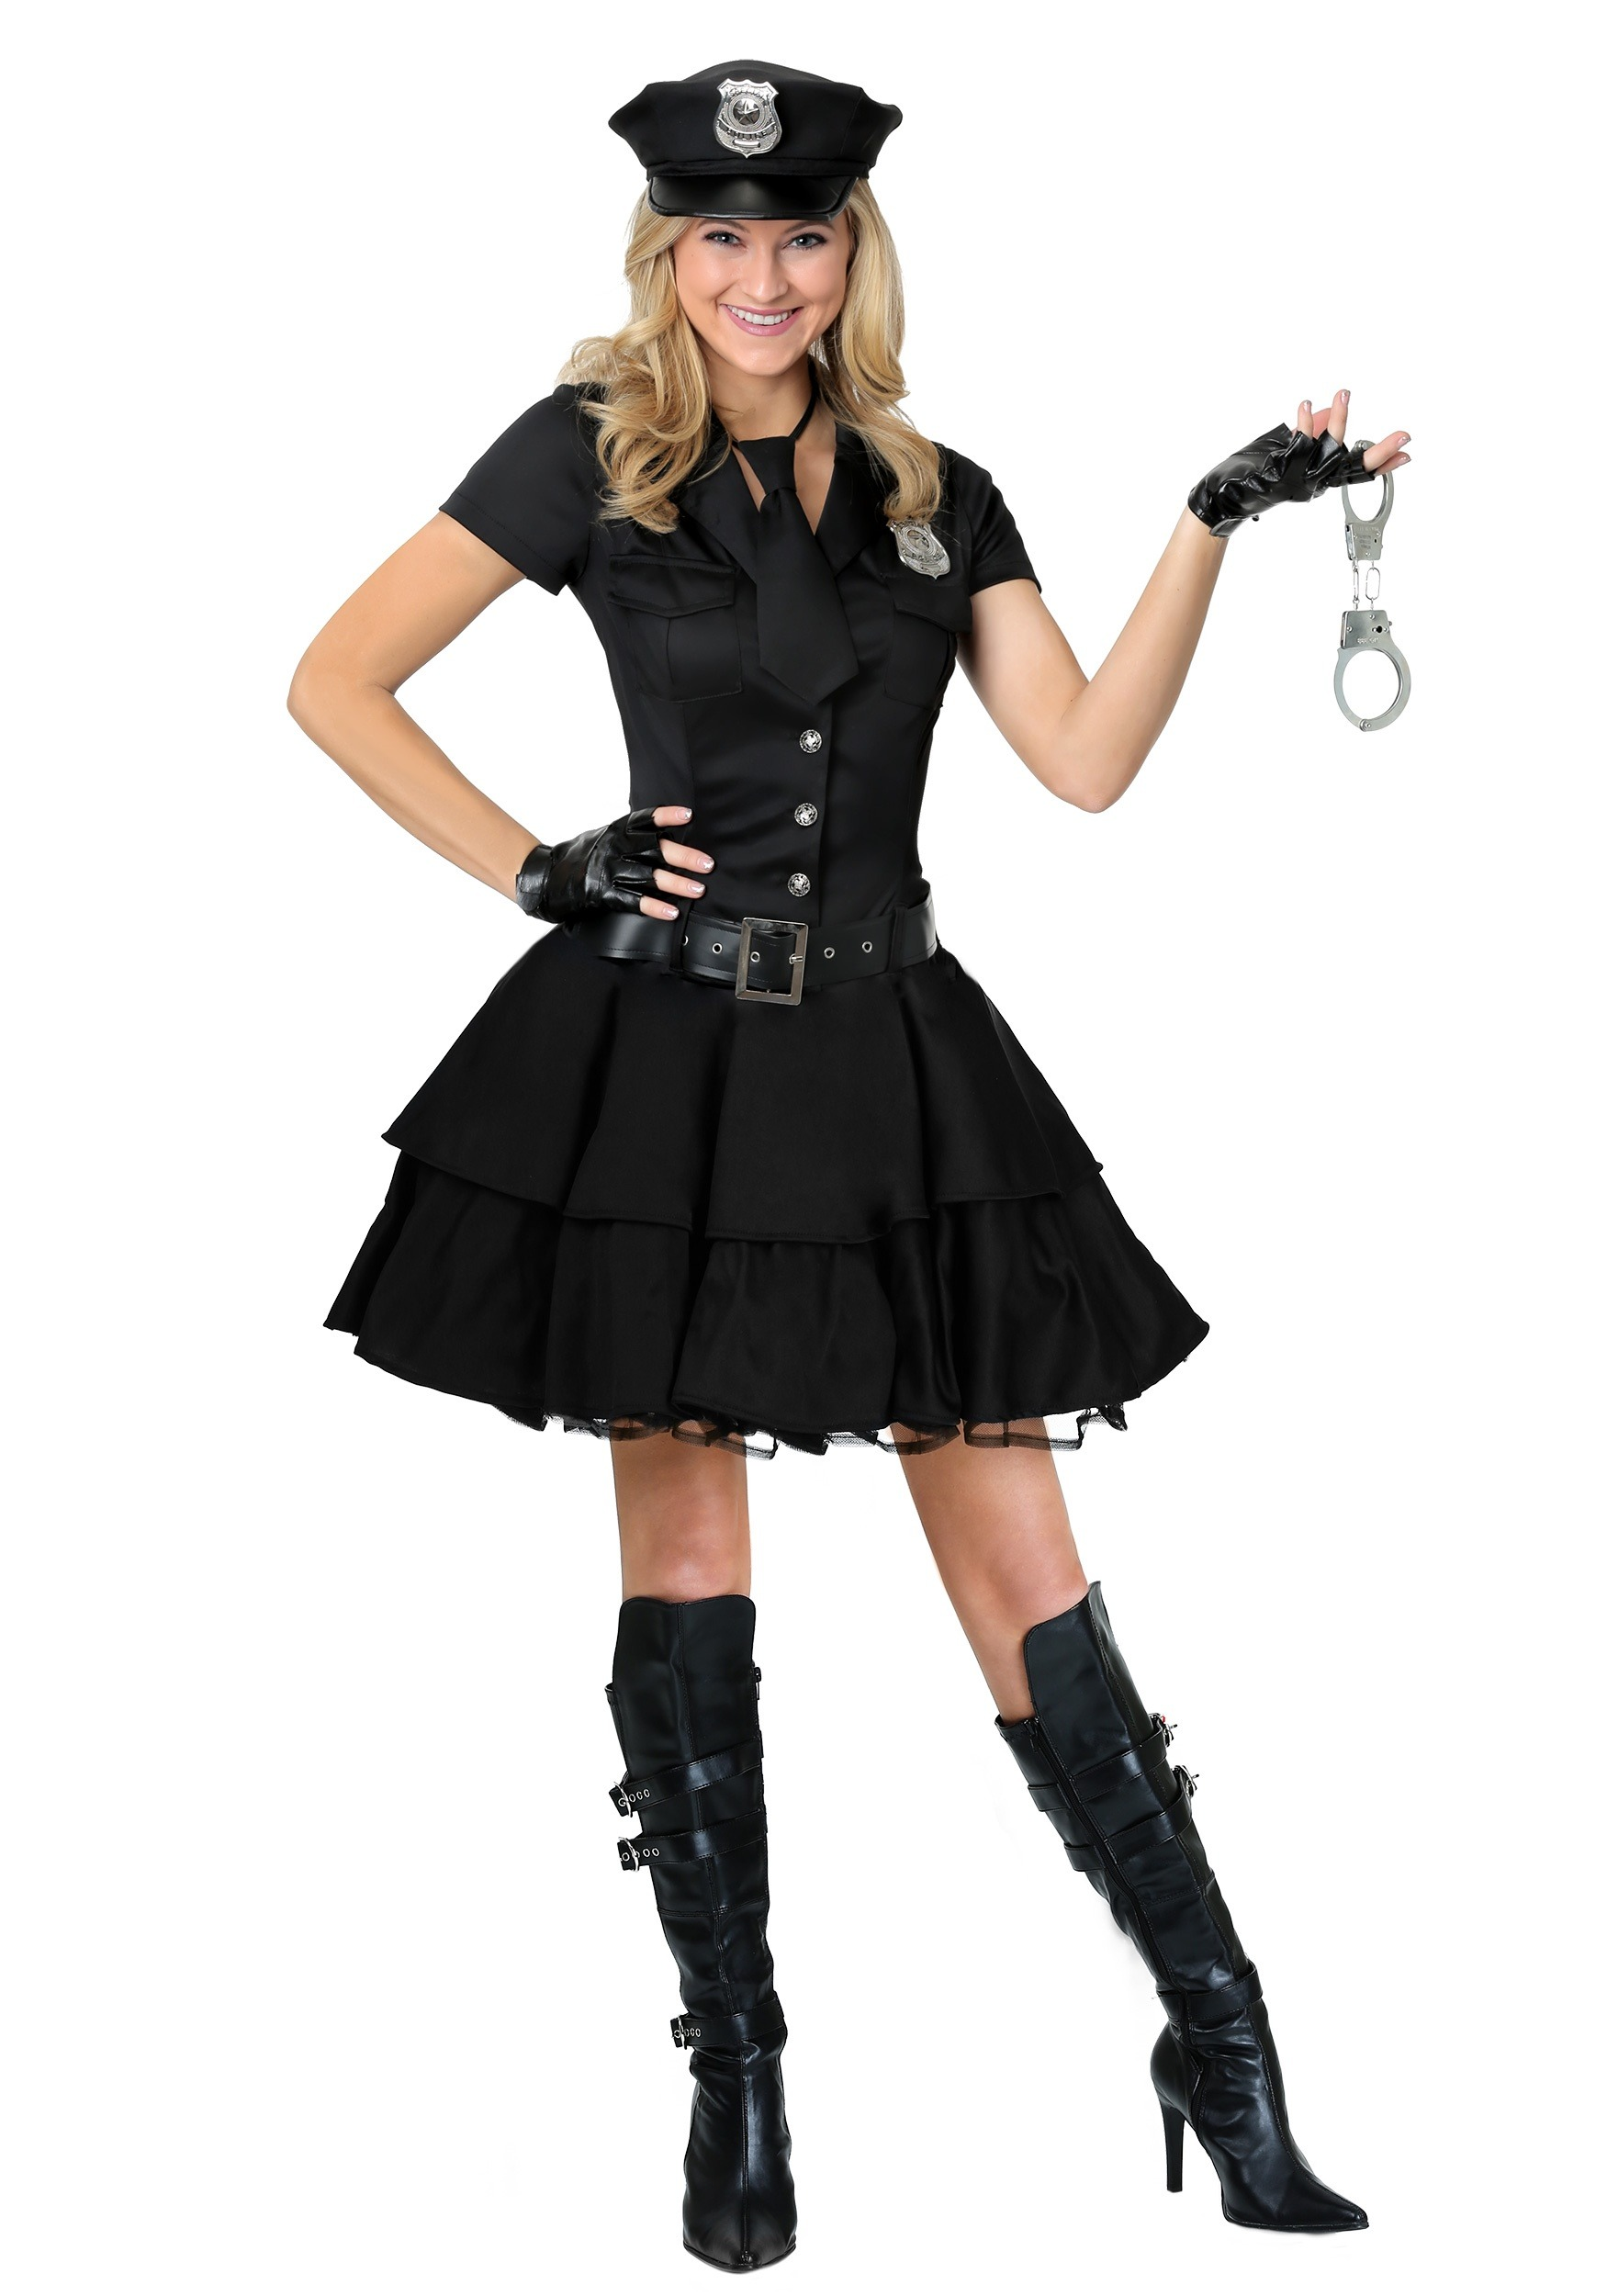 Reno 911 Halloween Costume.Adult Police Costumes Sexy Cop Uniforms Halloweencostumes Com